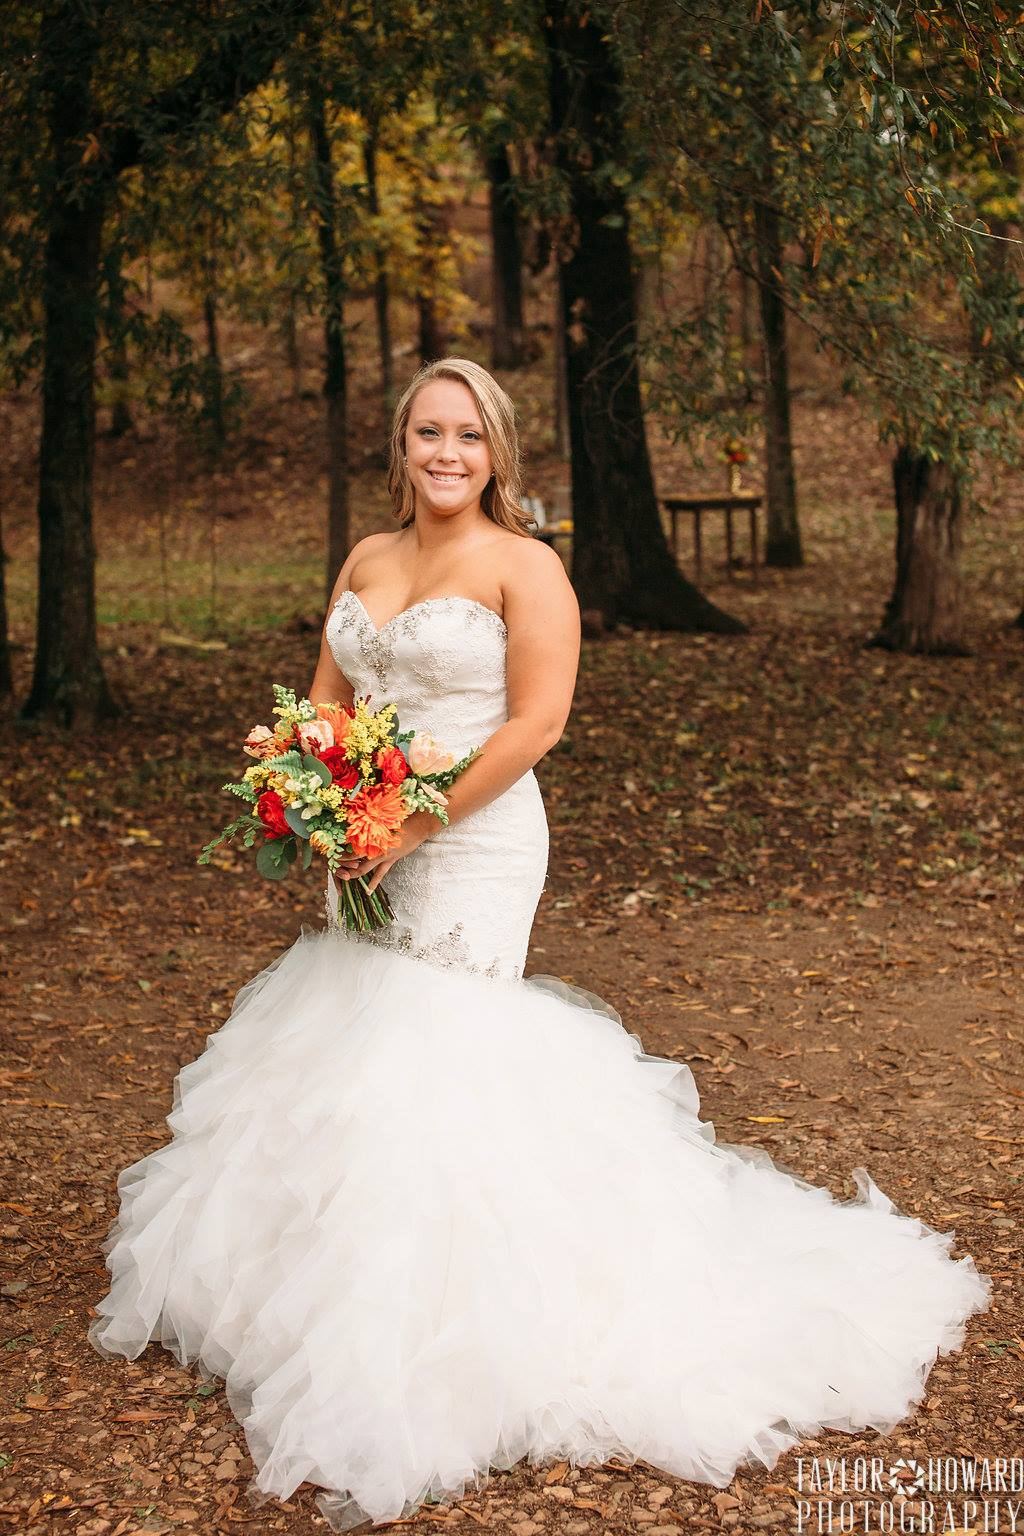 Taylor Howard Photography , from  Samantha + Matt 's wedding